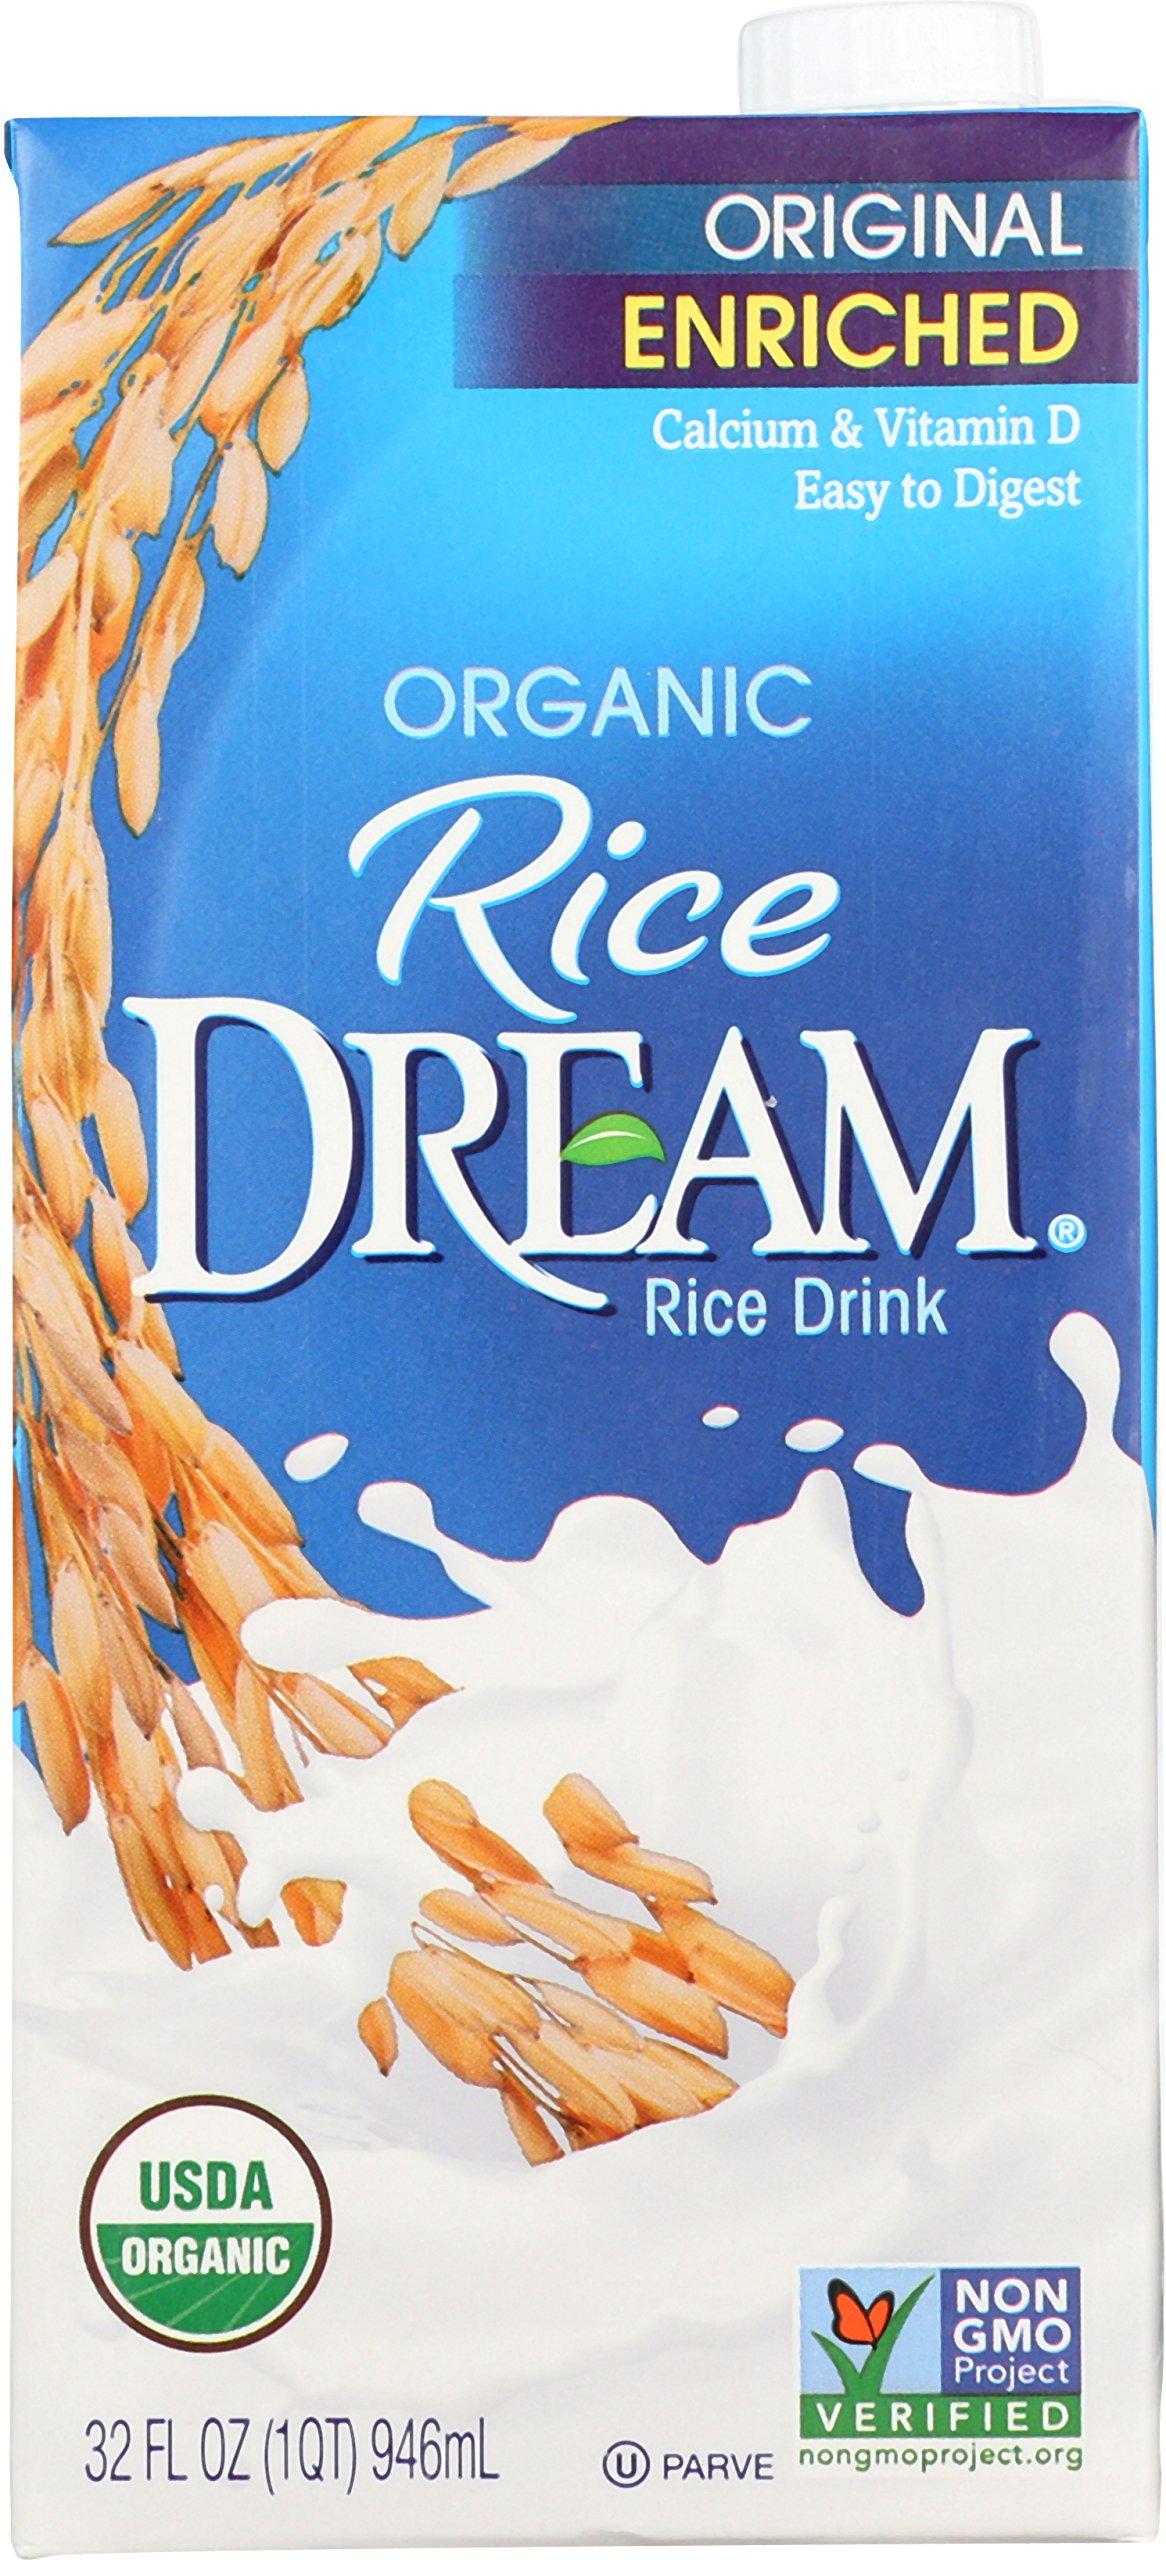 Rice Dream Enriched, Original, Organic, 32 oz